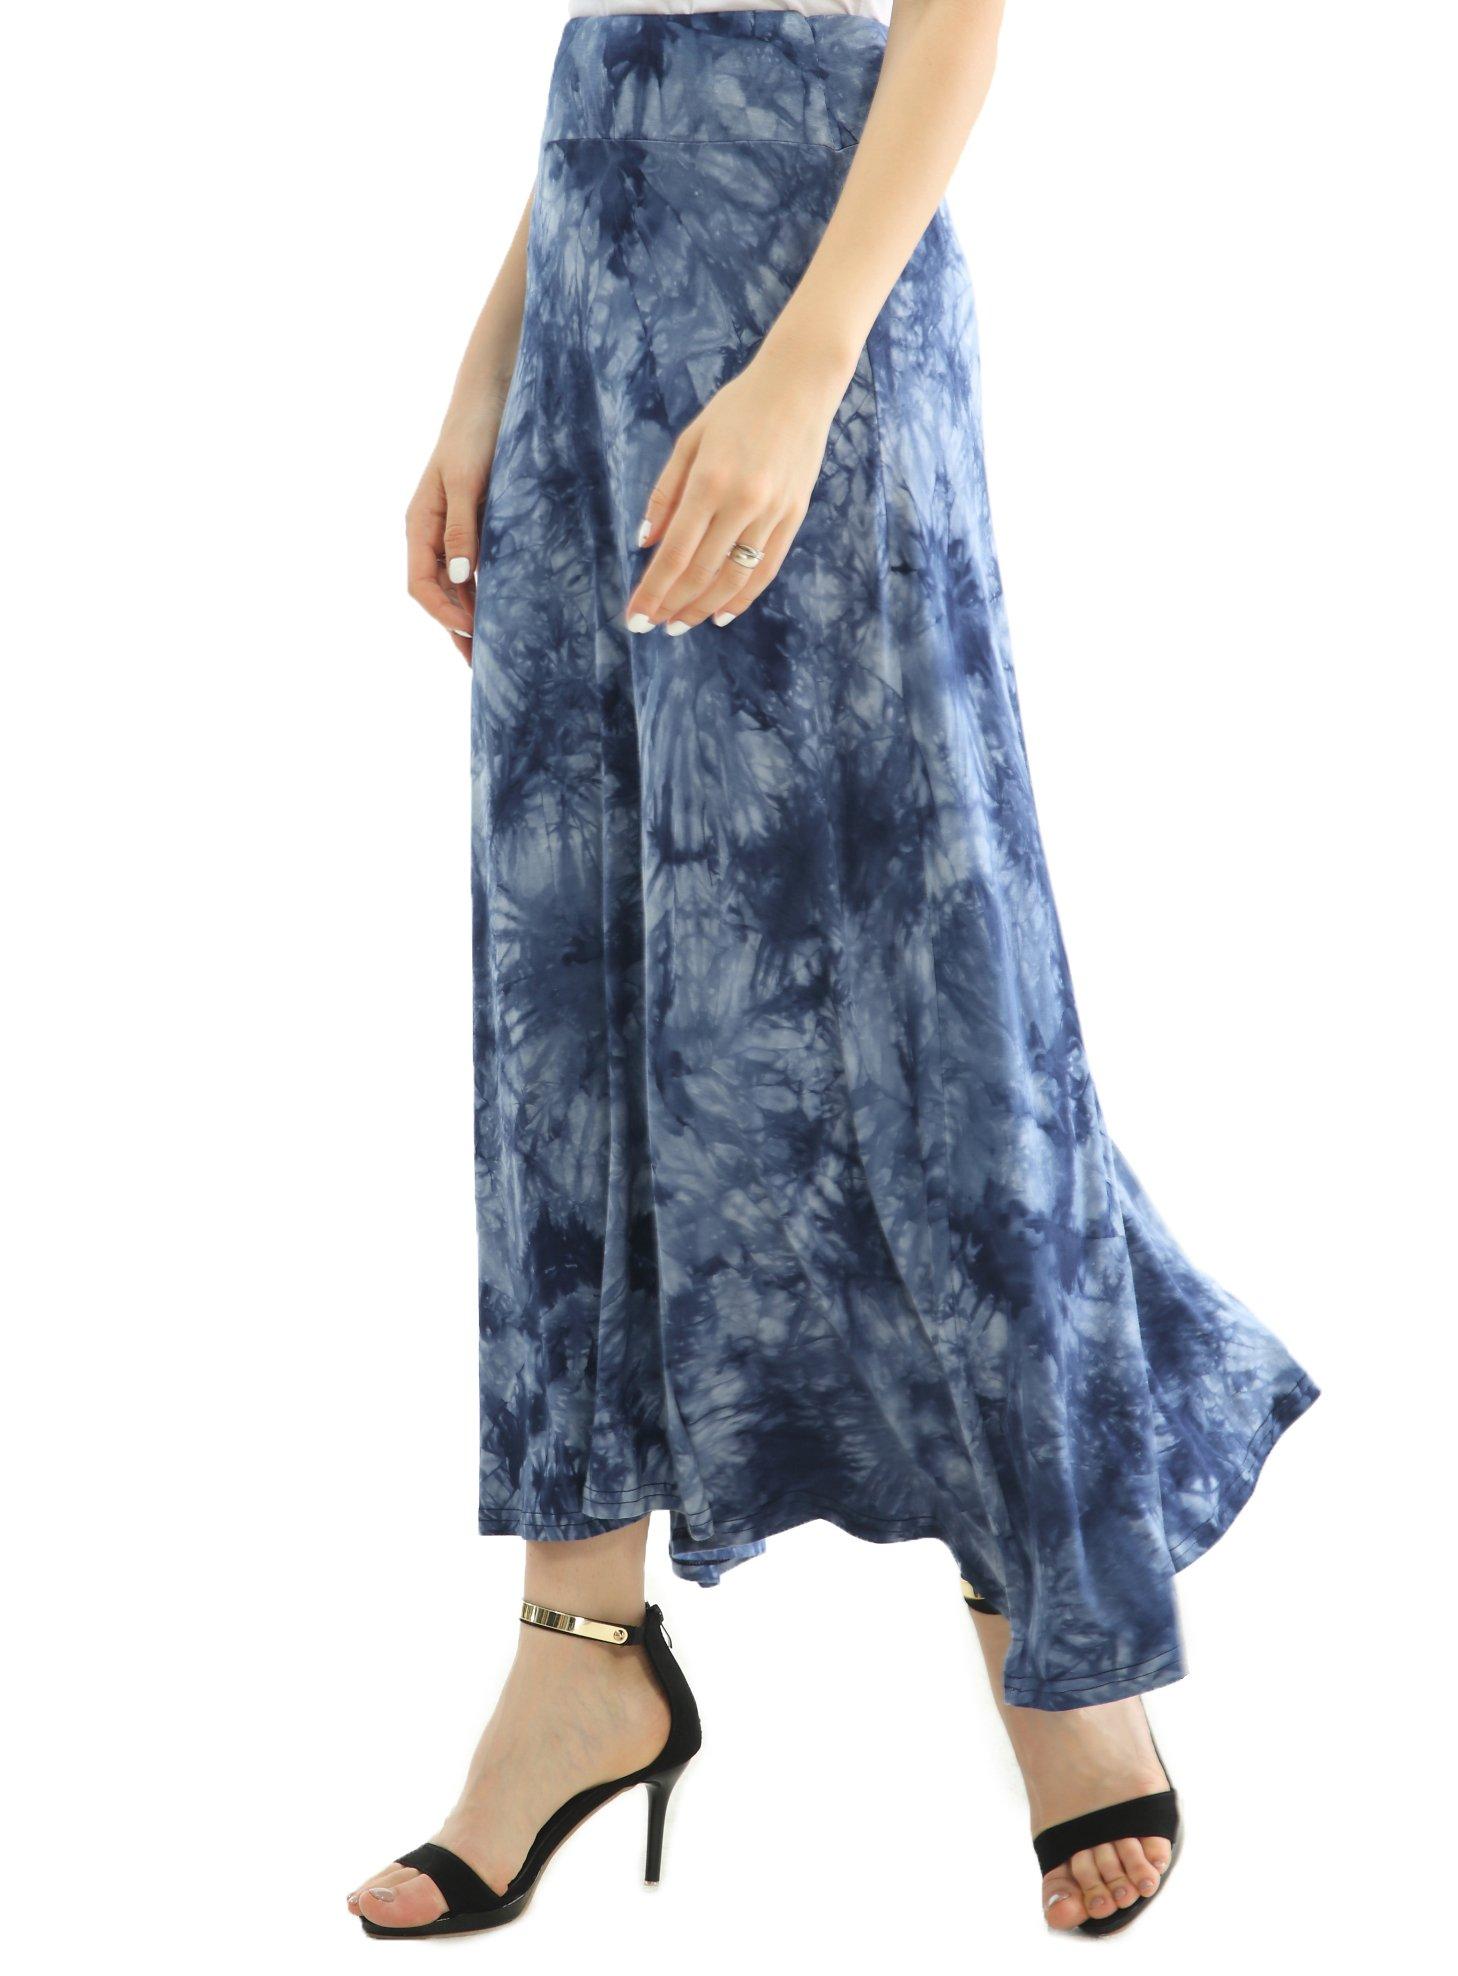 JOAUR Women's Casual Skirts Tie Dye Elastic Waist Fold Over Long Blue Maxi Skirt by JOAUR